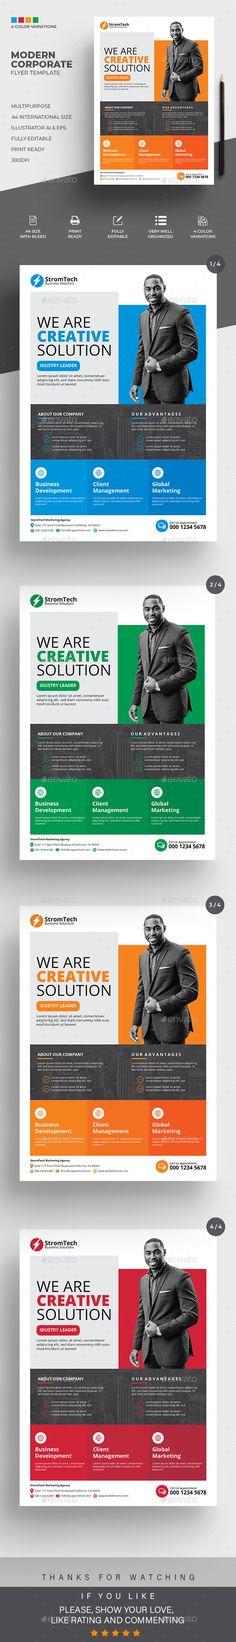 Corporate Flyer. Customizable business flyer template. #a4 #abstract #AbstractFlyer #advert #advertisement #agency #AgencyFlyer #agent #business #clean #CleanDesign #ConferenceFlyer #corporate #creative #editable #FlyerTemplate #green #GreenFlyer #GroupStudy #IllustratorFlyer #marketing #MeetupFlyer #MinimalistFlyer #multipurpose Business Flyer Templates, Corporate Flyer, A4, In This Moment, Marketing, Abstract, Creative, Green, Summary